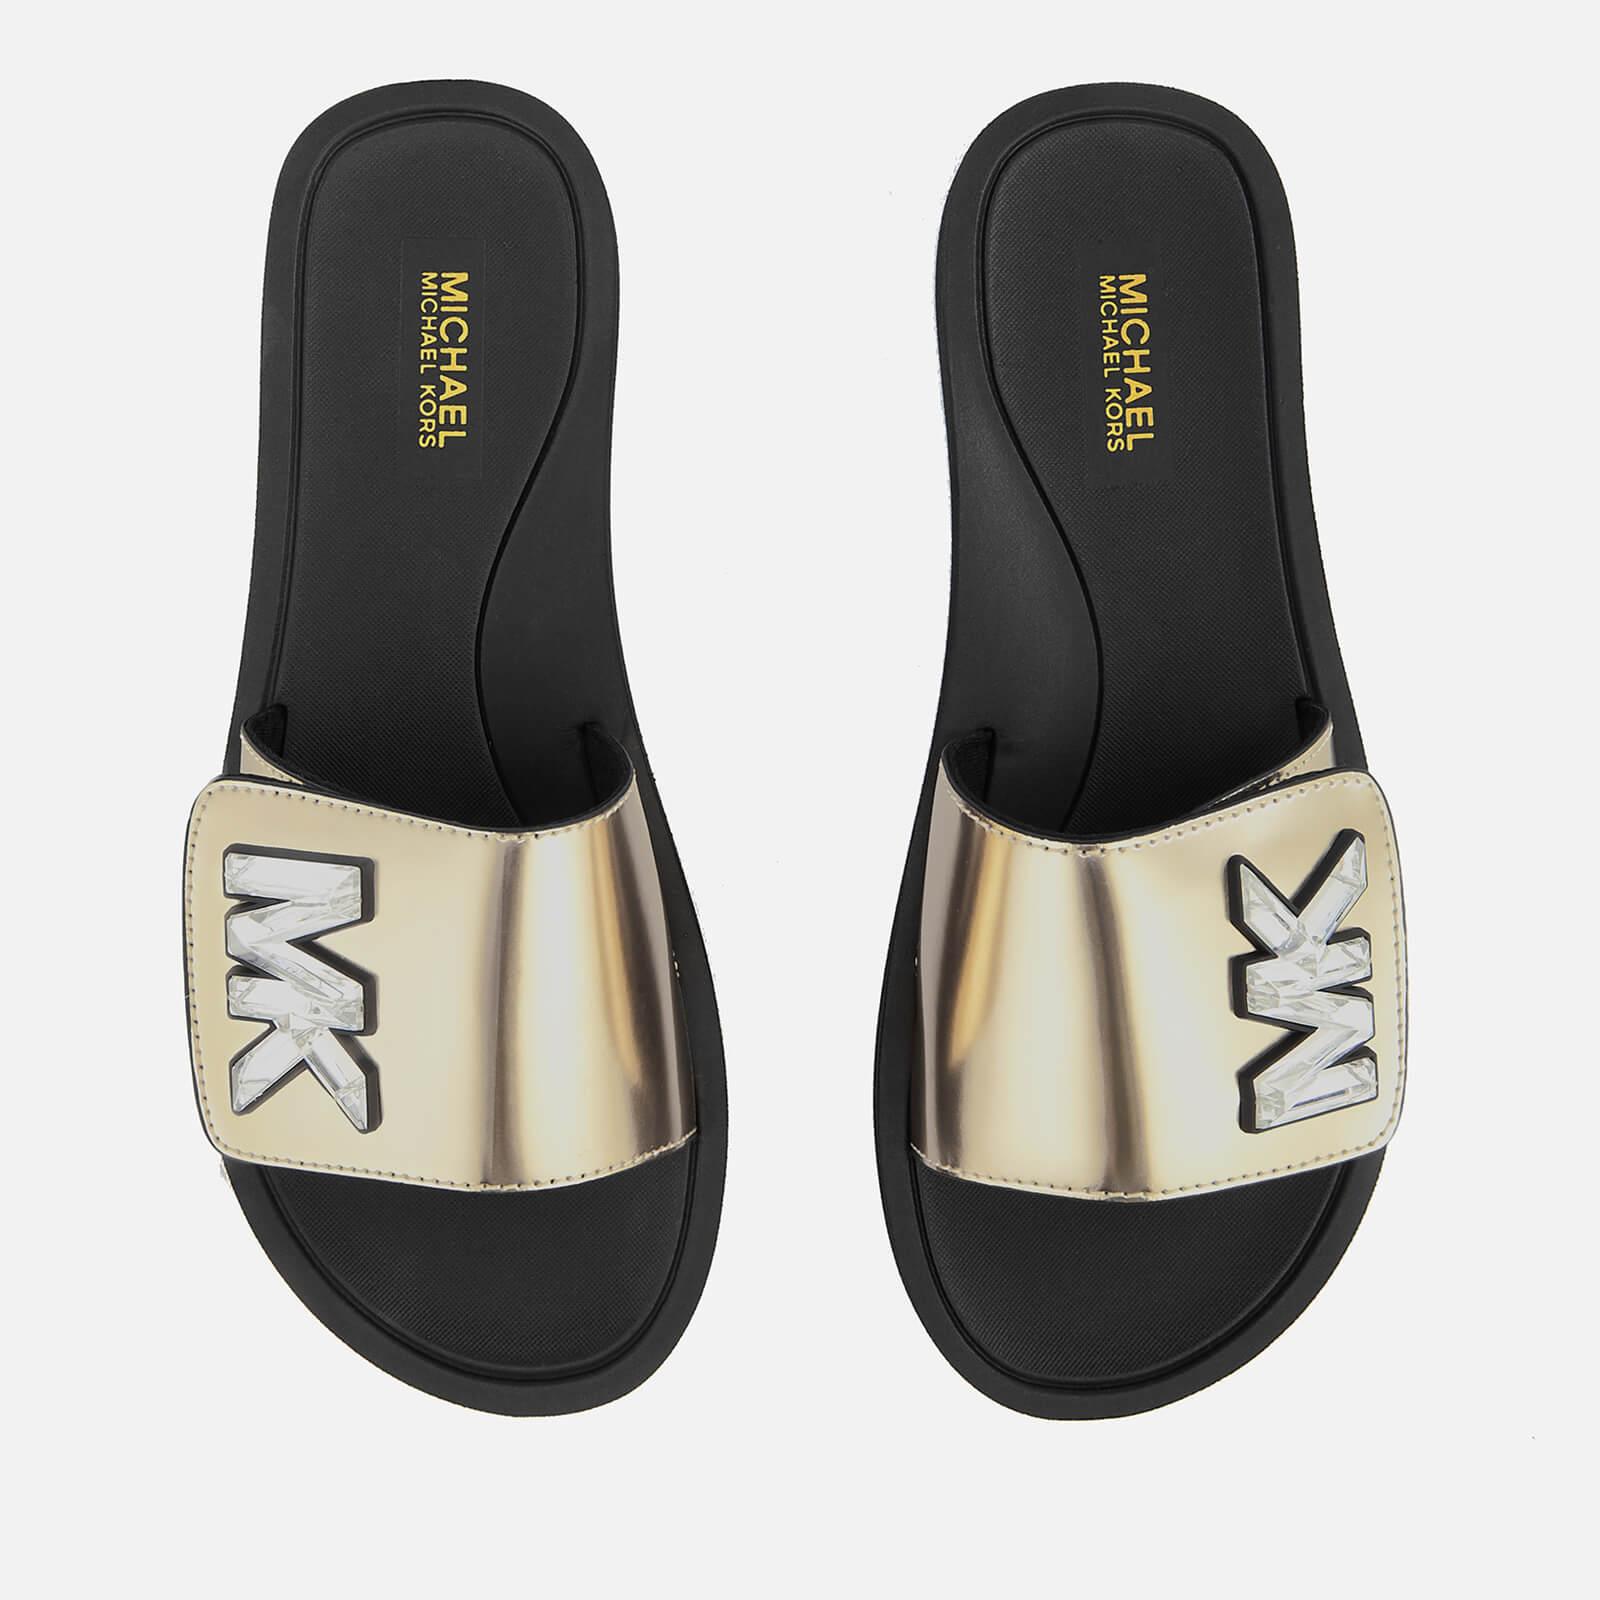 MICHAEL MICHAEL KORS Women's MK Slide Sandals - Pale Gold - UK 5/US 8 - Gold